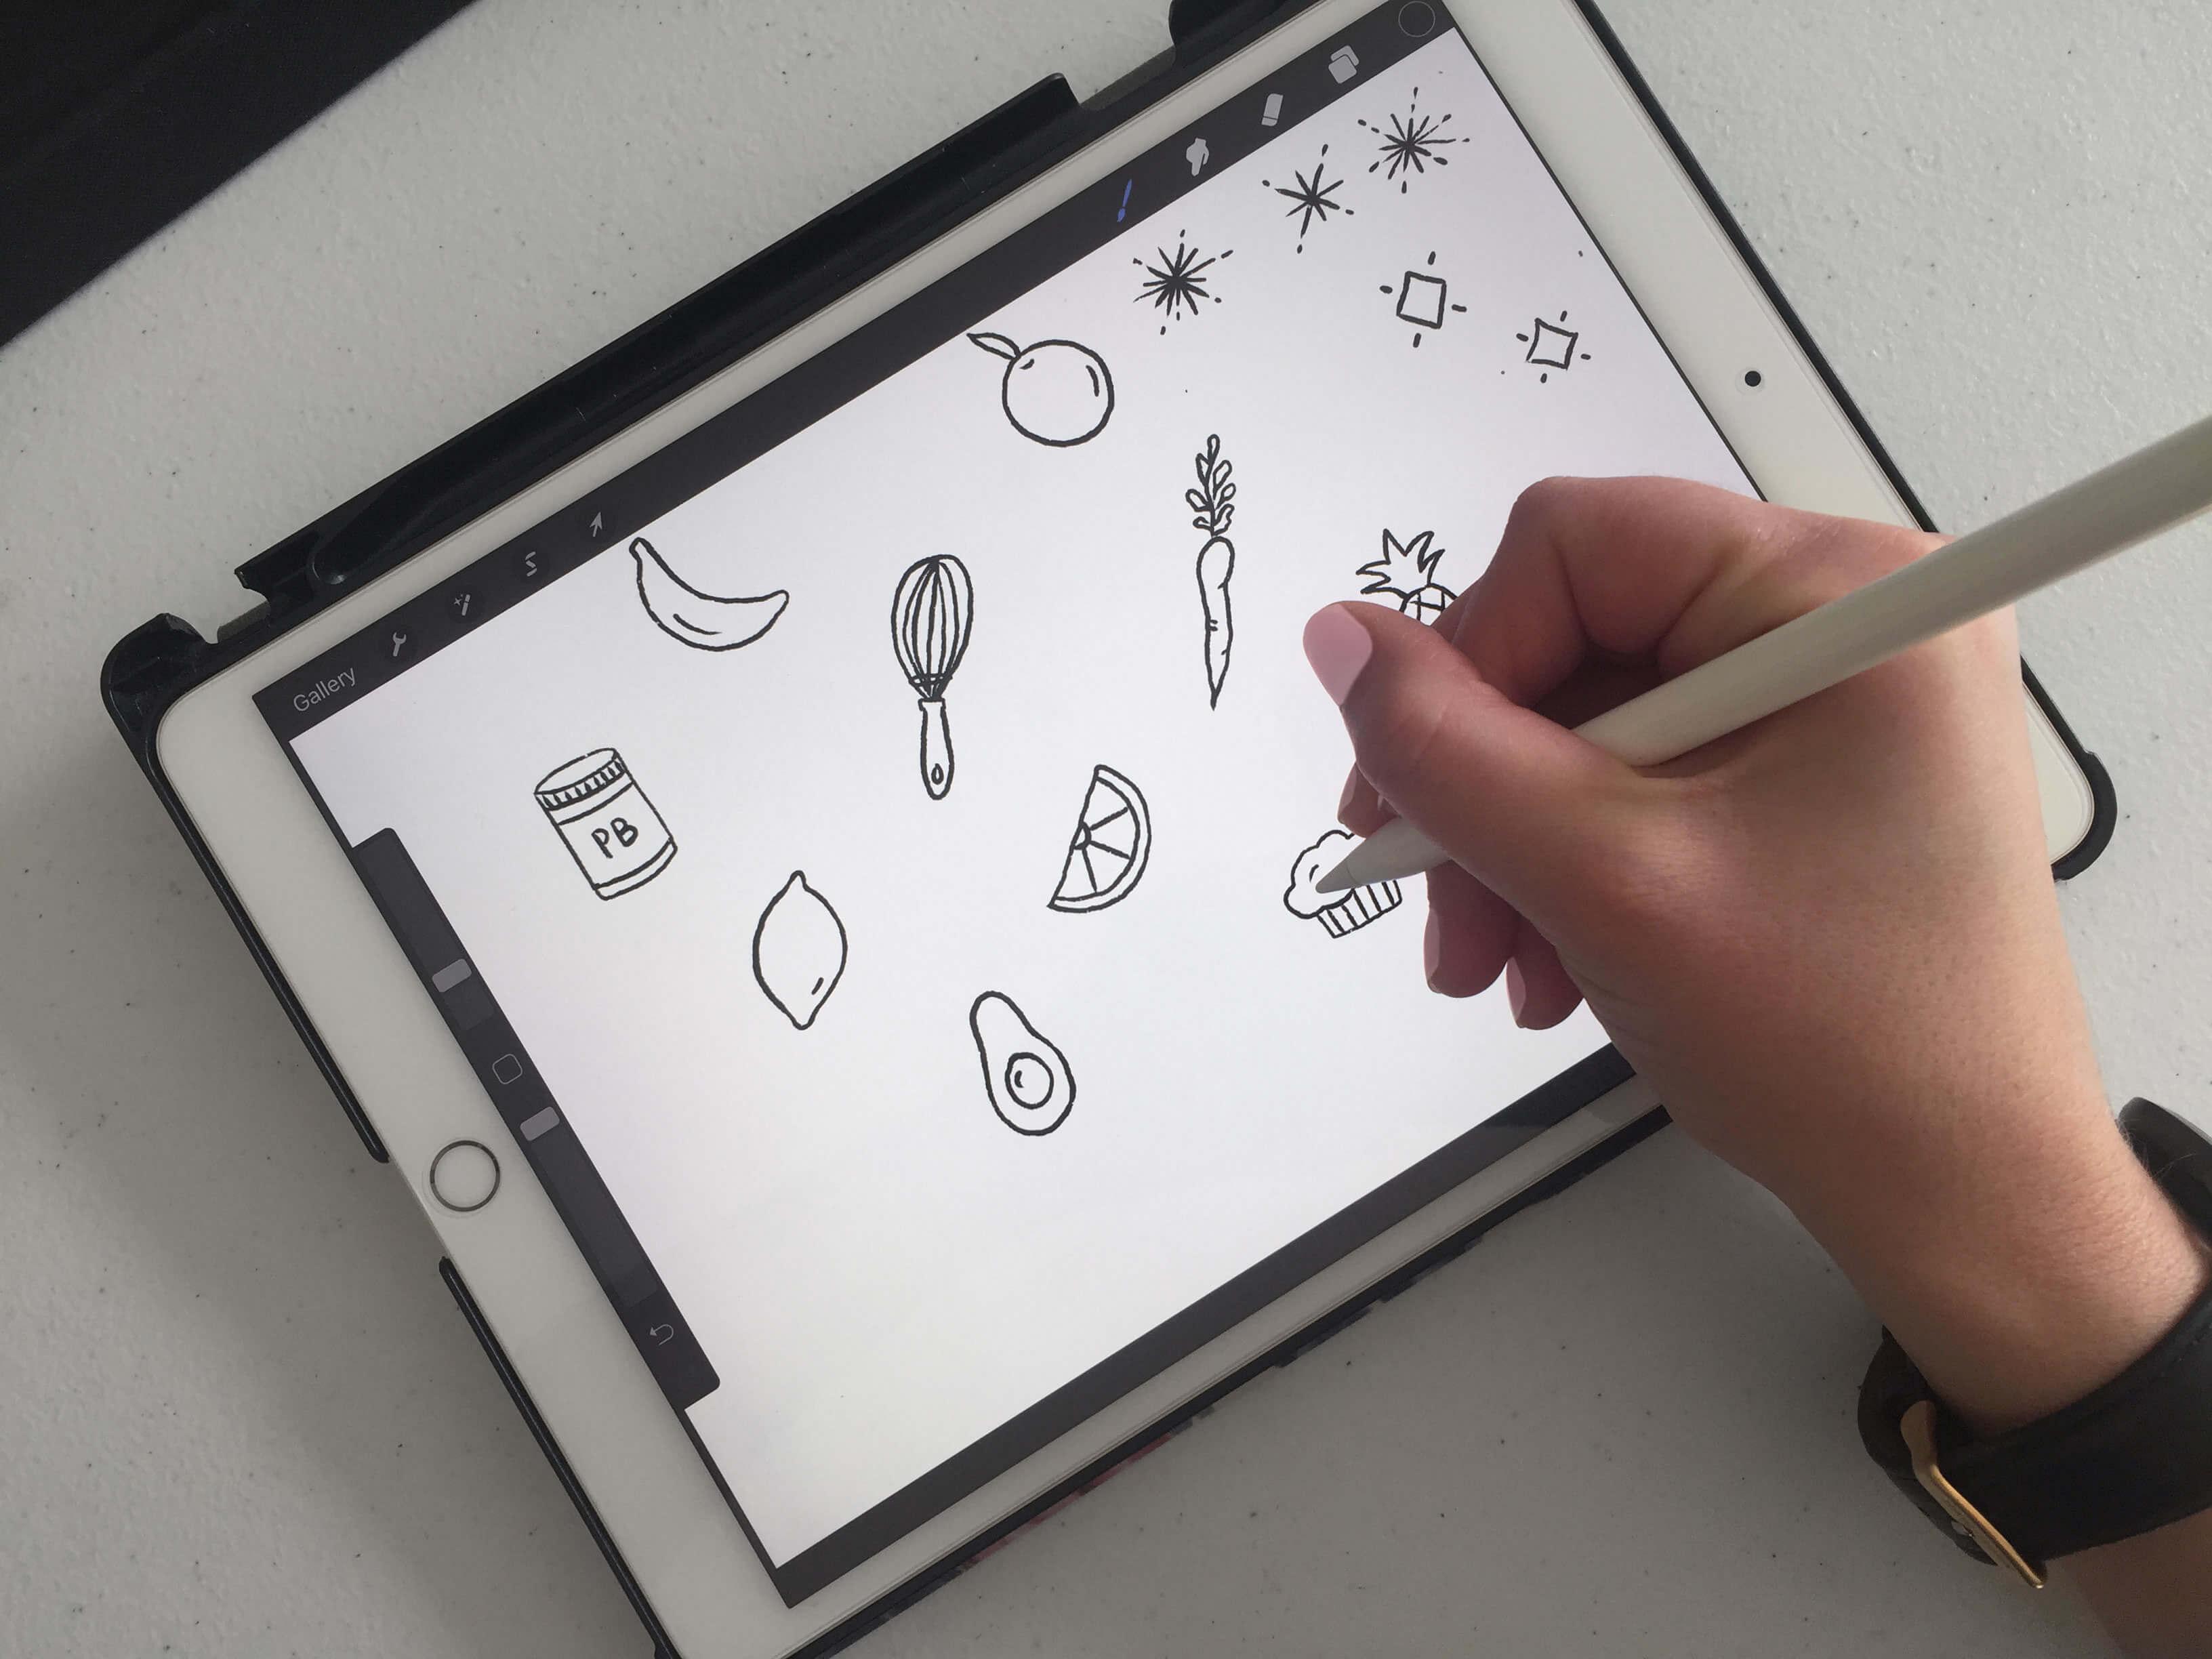 Push-ups and Peanut Butter iPad illustrations